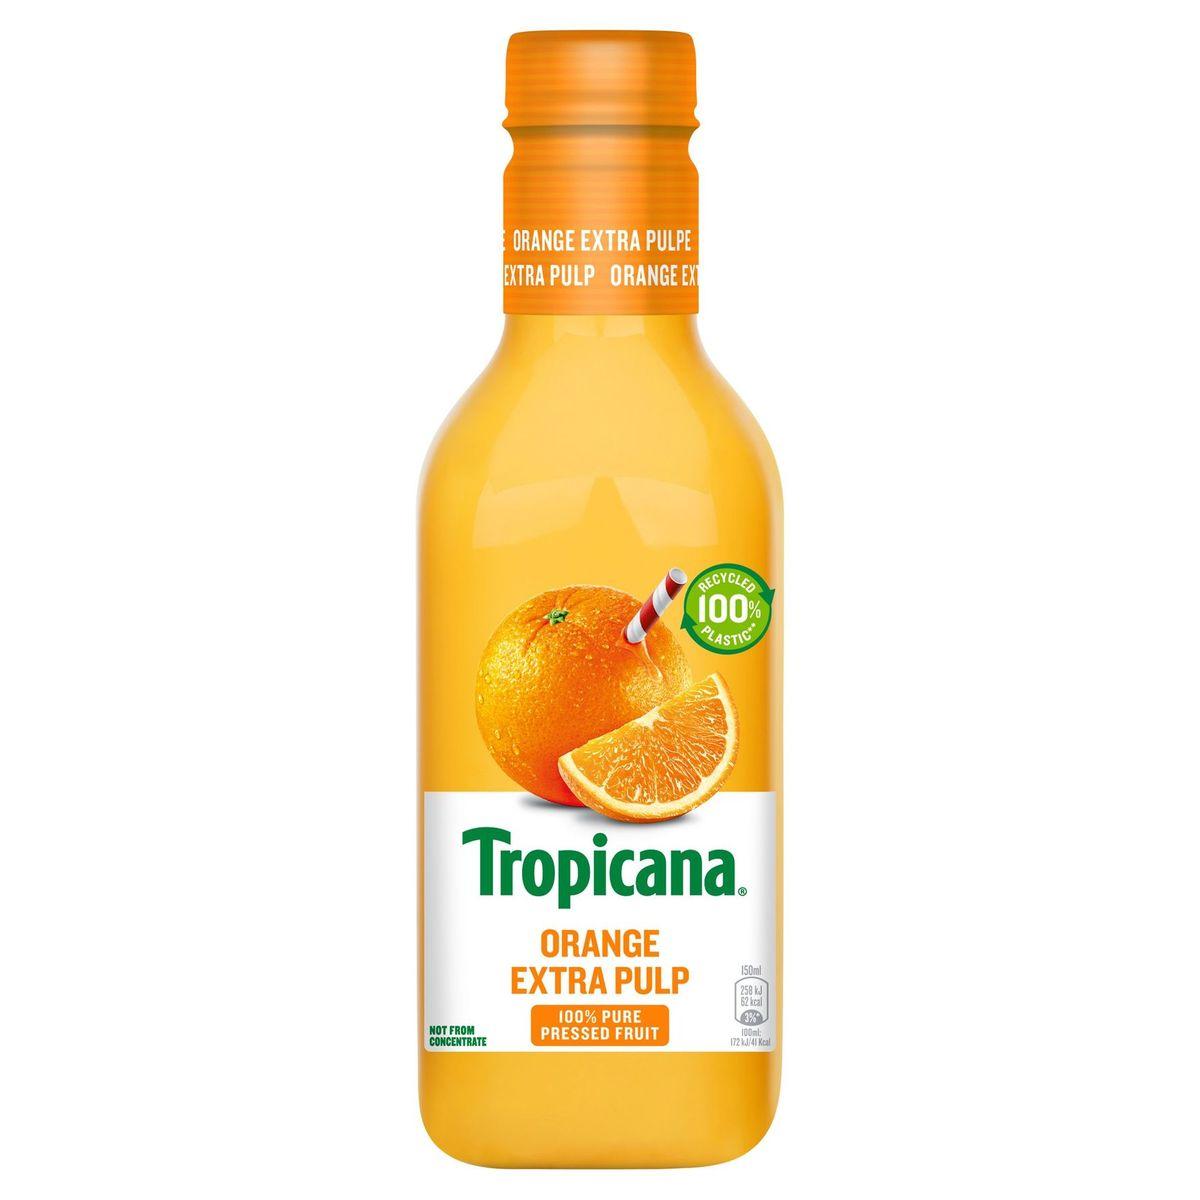 Tropicana Sinaasappelsap Met Extra Pulp Vers Fruitsap 90 cl